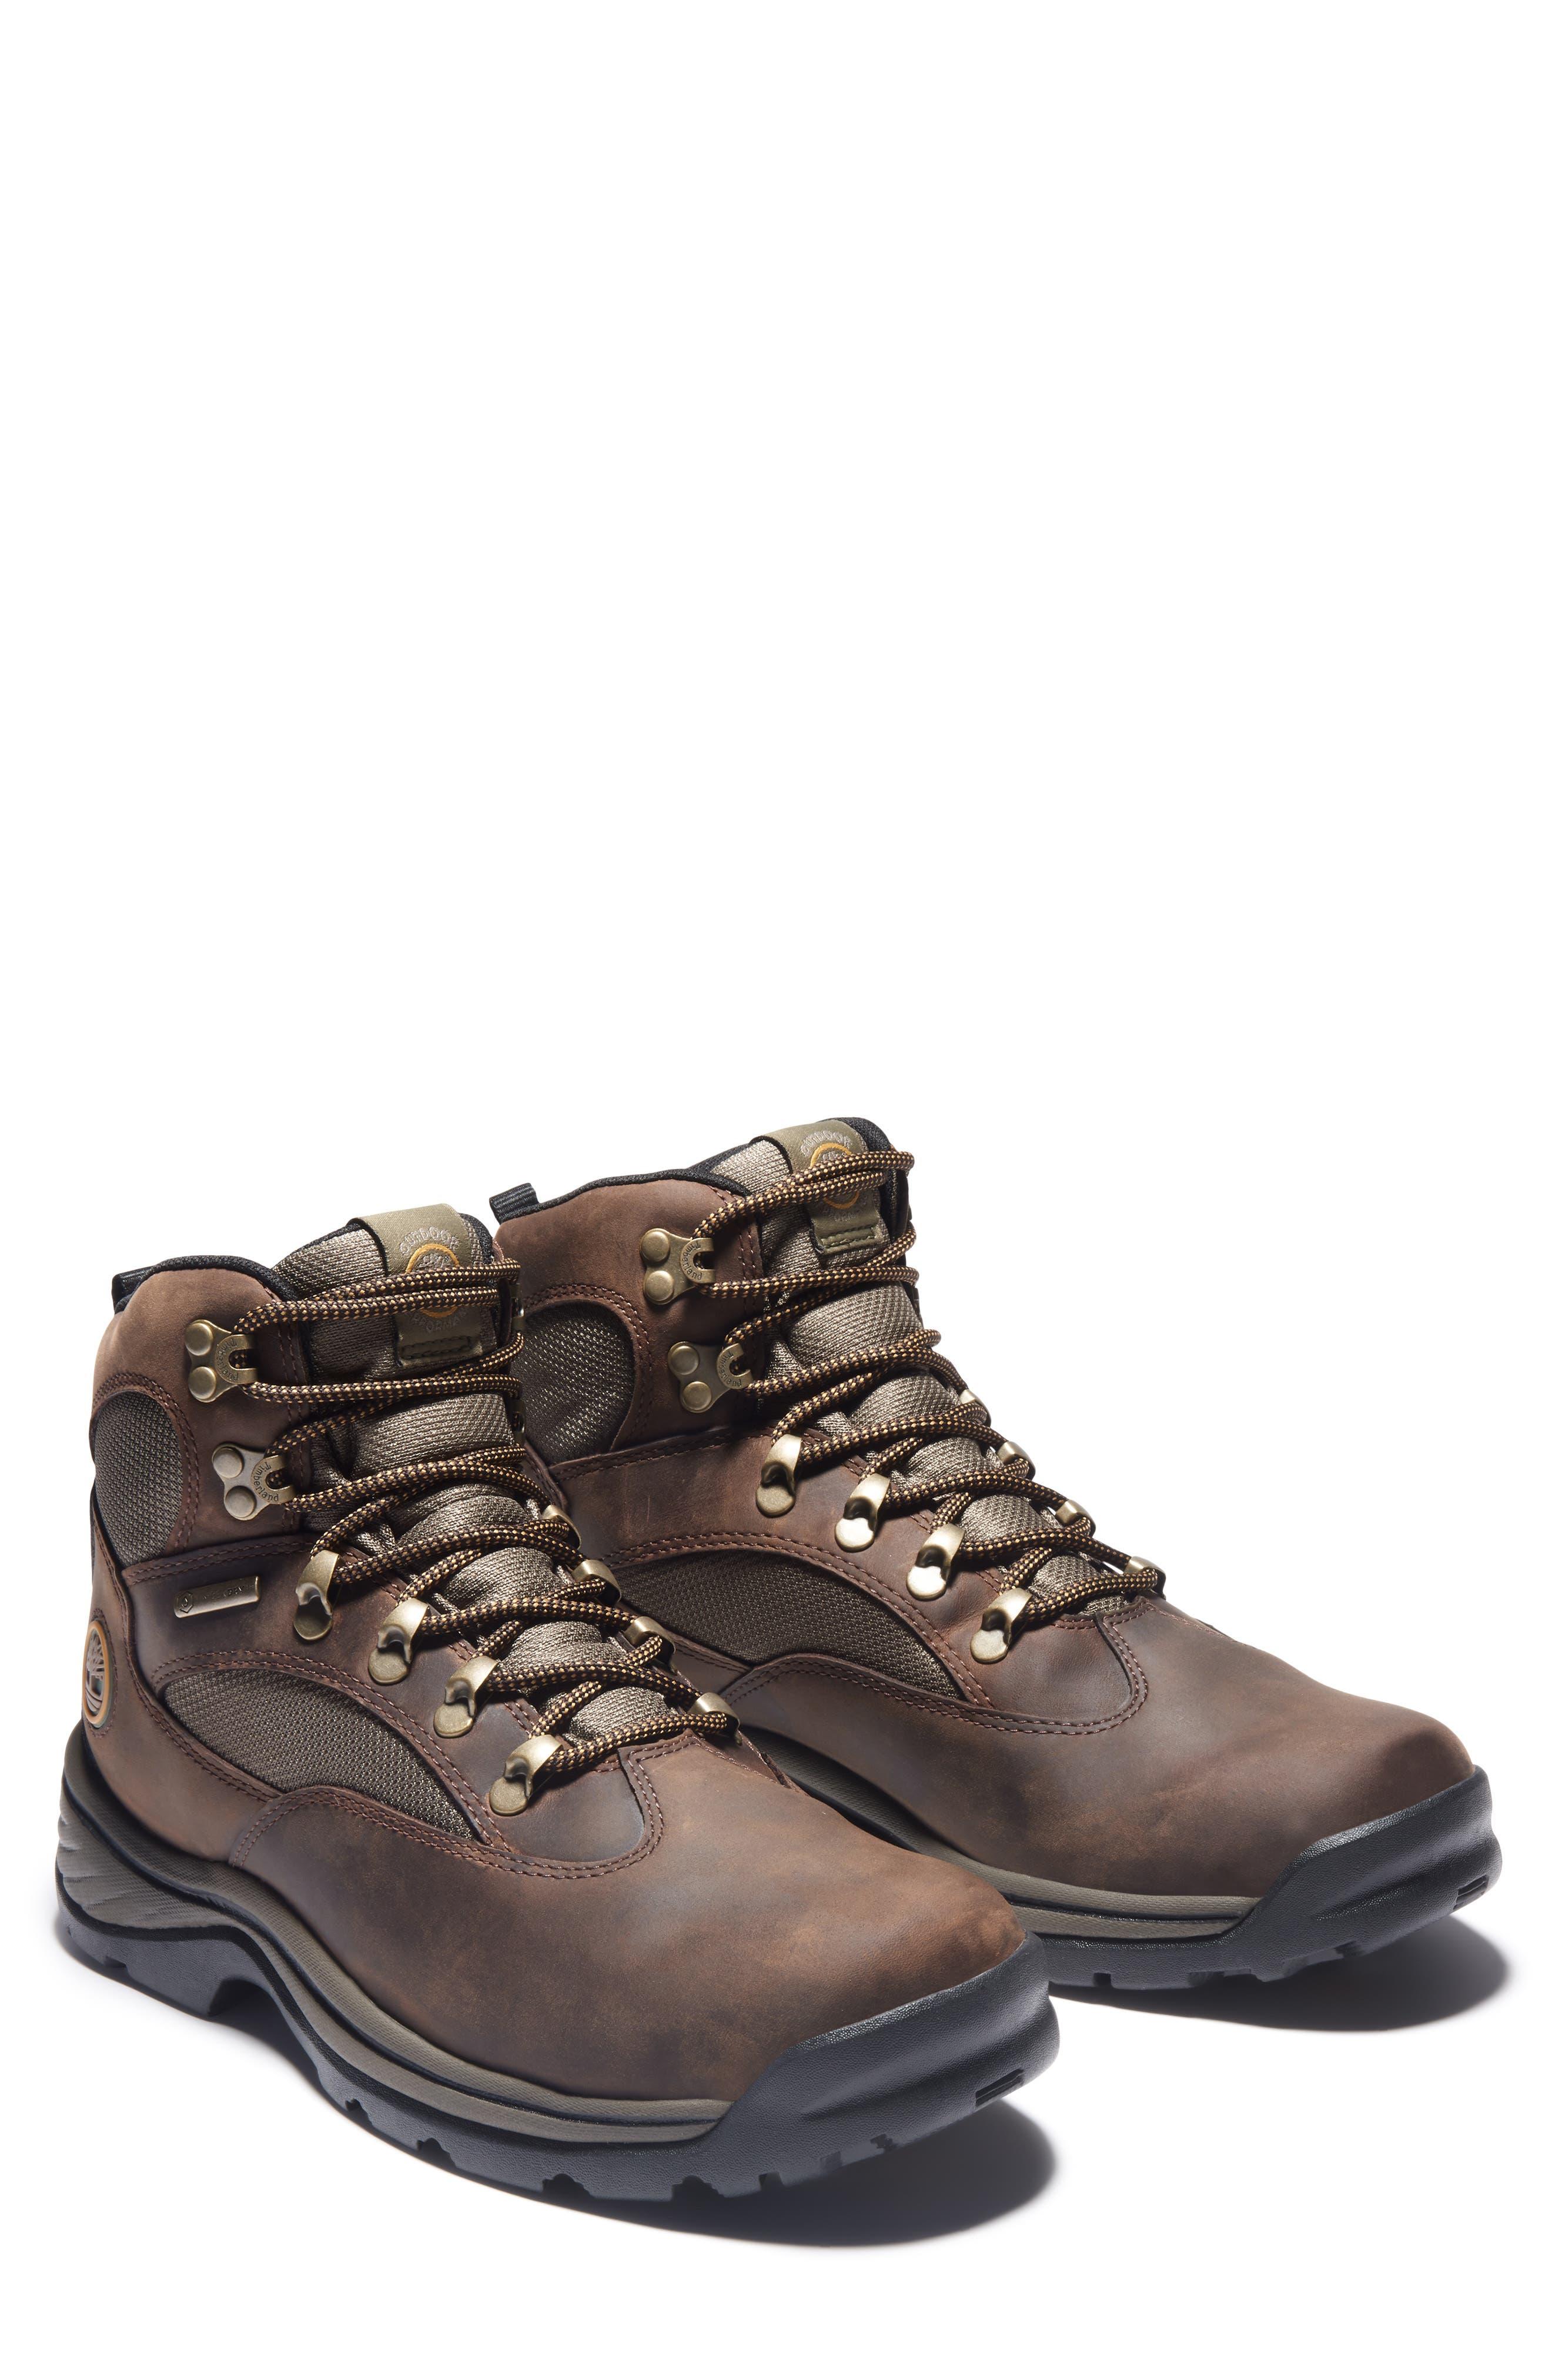 Men's Timberland Shoes Nordstrom  Nordstrom